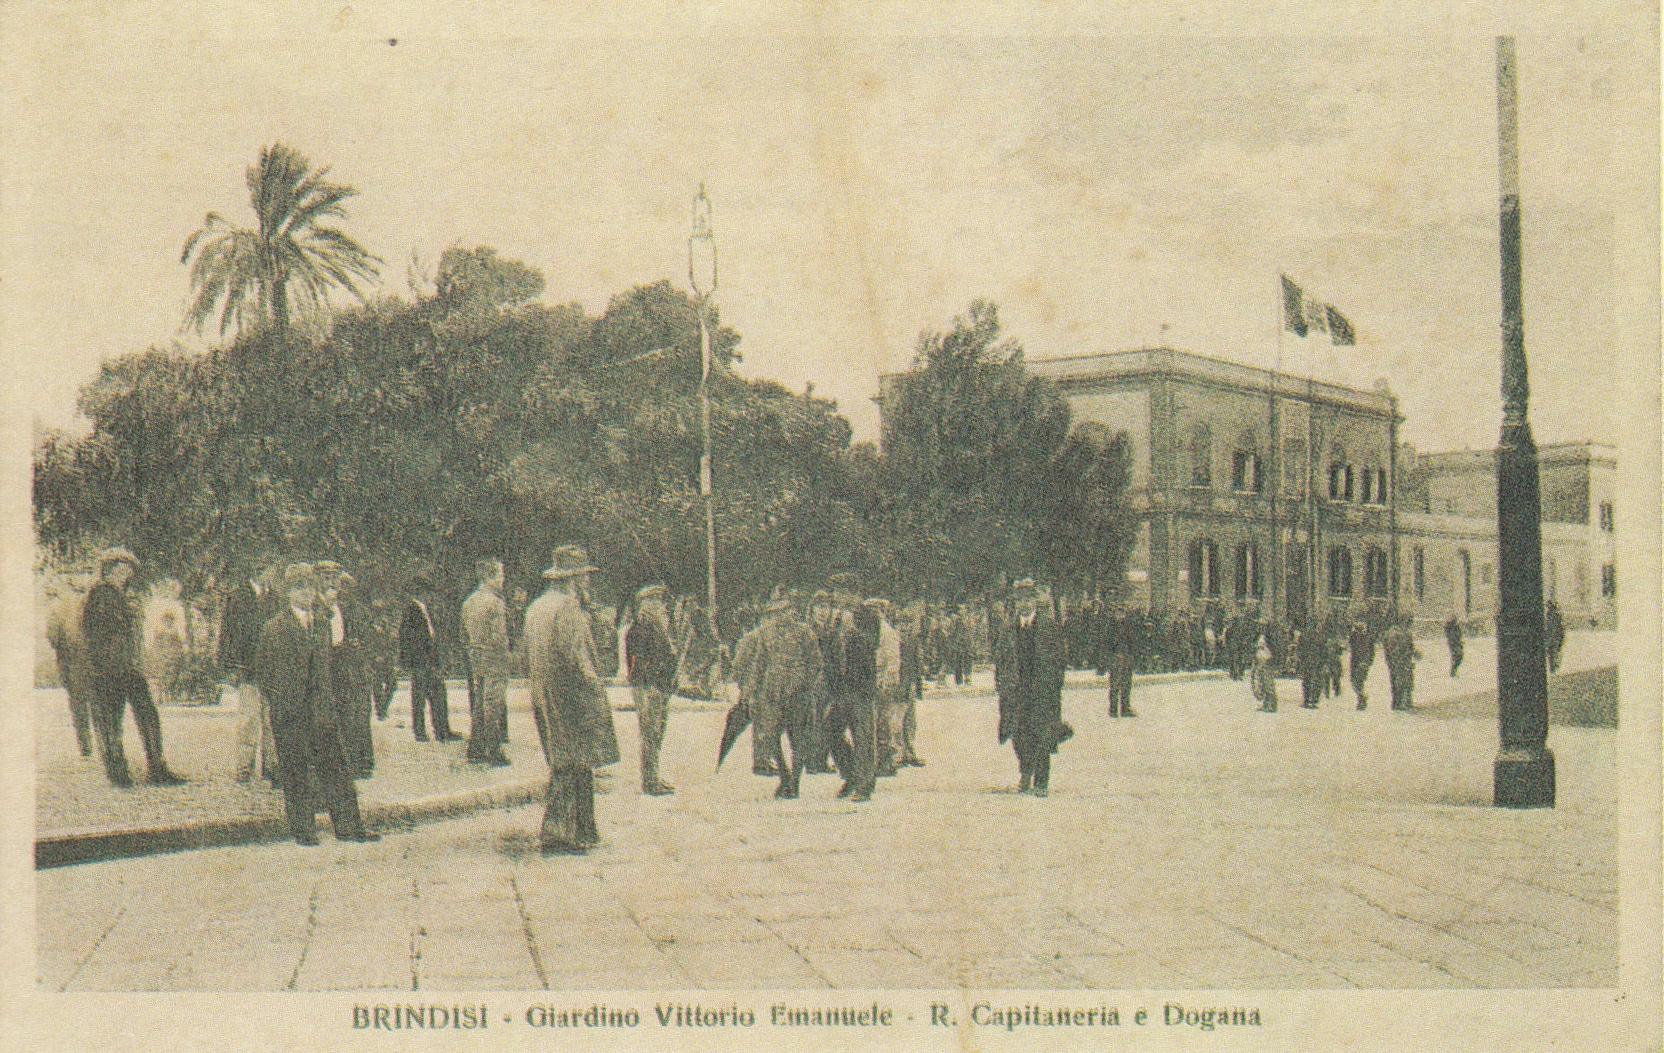 giardinetti Capitaneria e Dogana